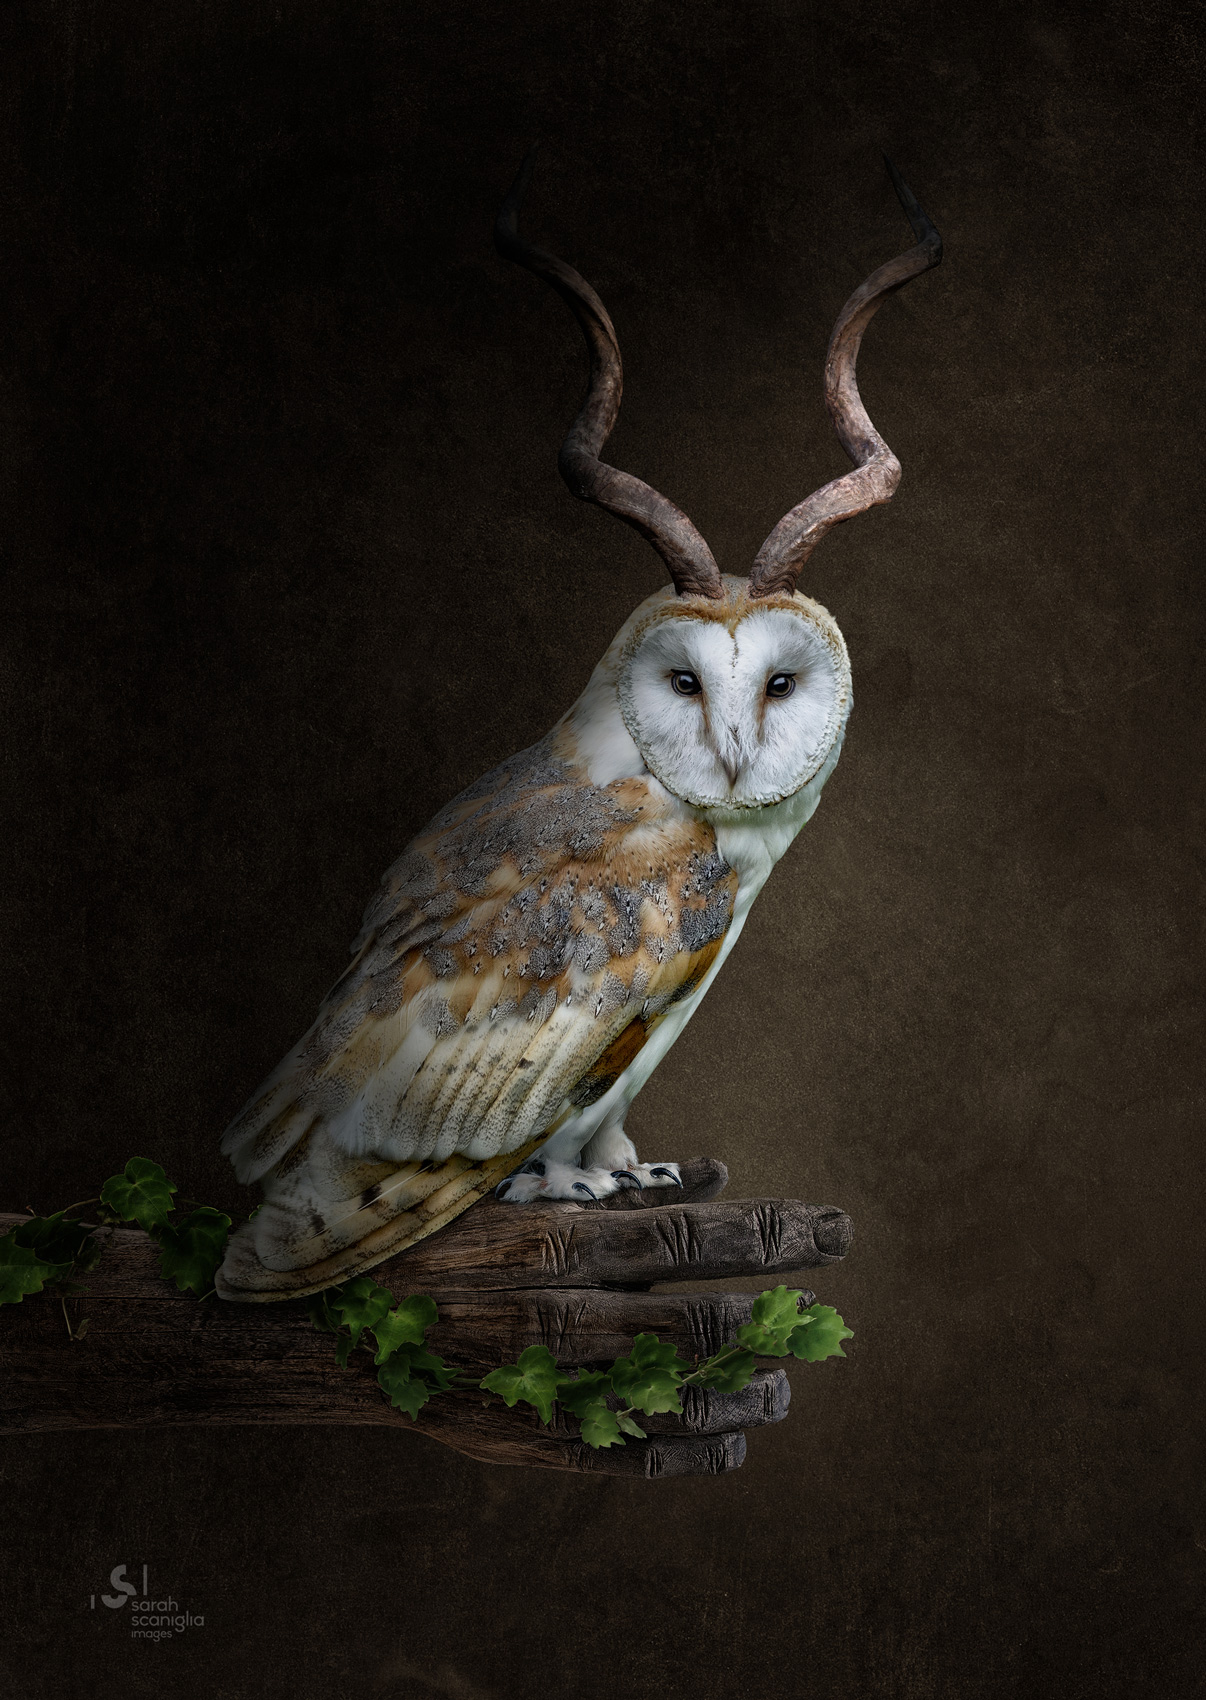 Sarah-Scaniglia-bestiaire-culture-fine-art-nantes-photographe-animaux-nanture-imaginaire-studio-photo-photoshop-compositing-artiste-chouette-cornes-antilope